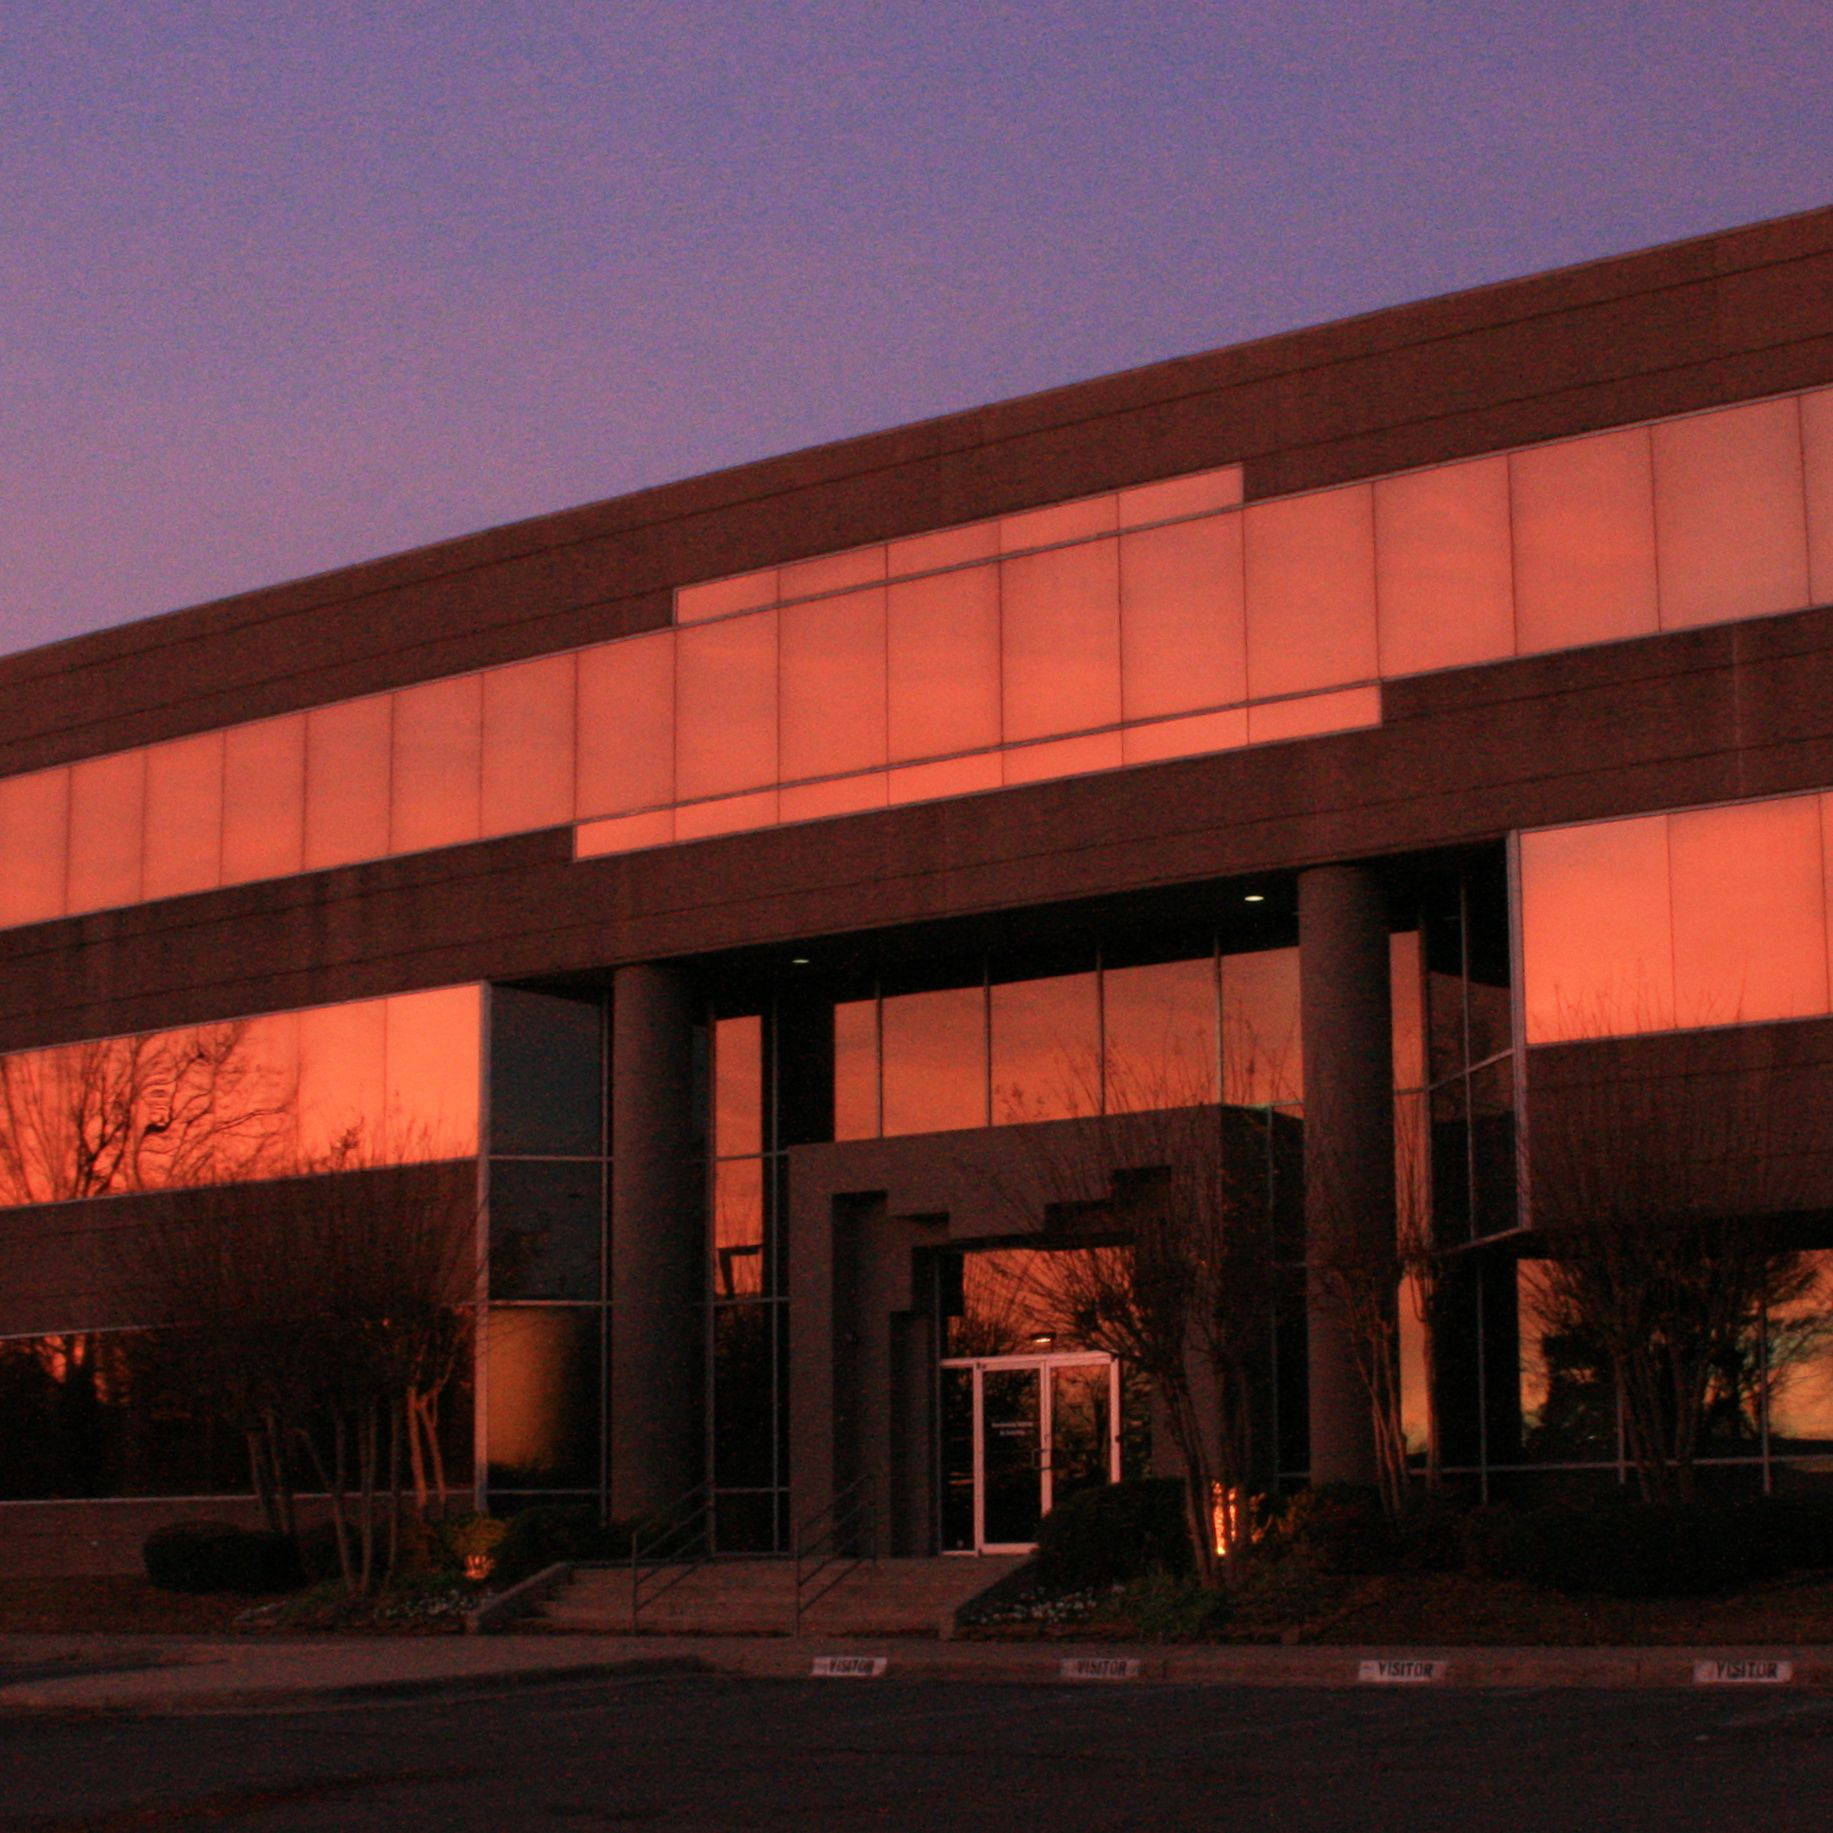 Lathrop Investment Management Corporation